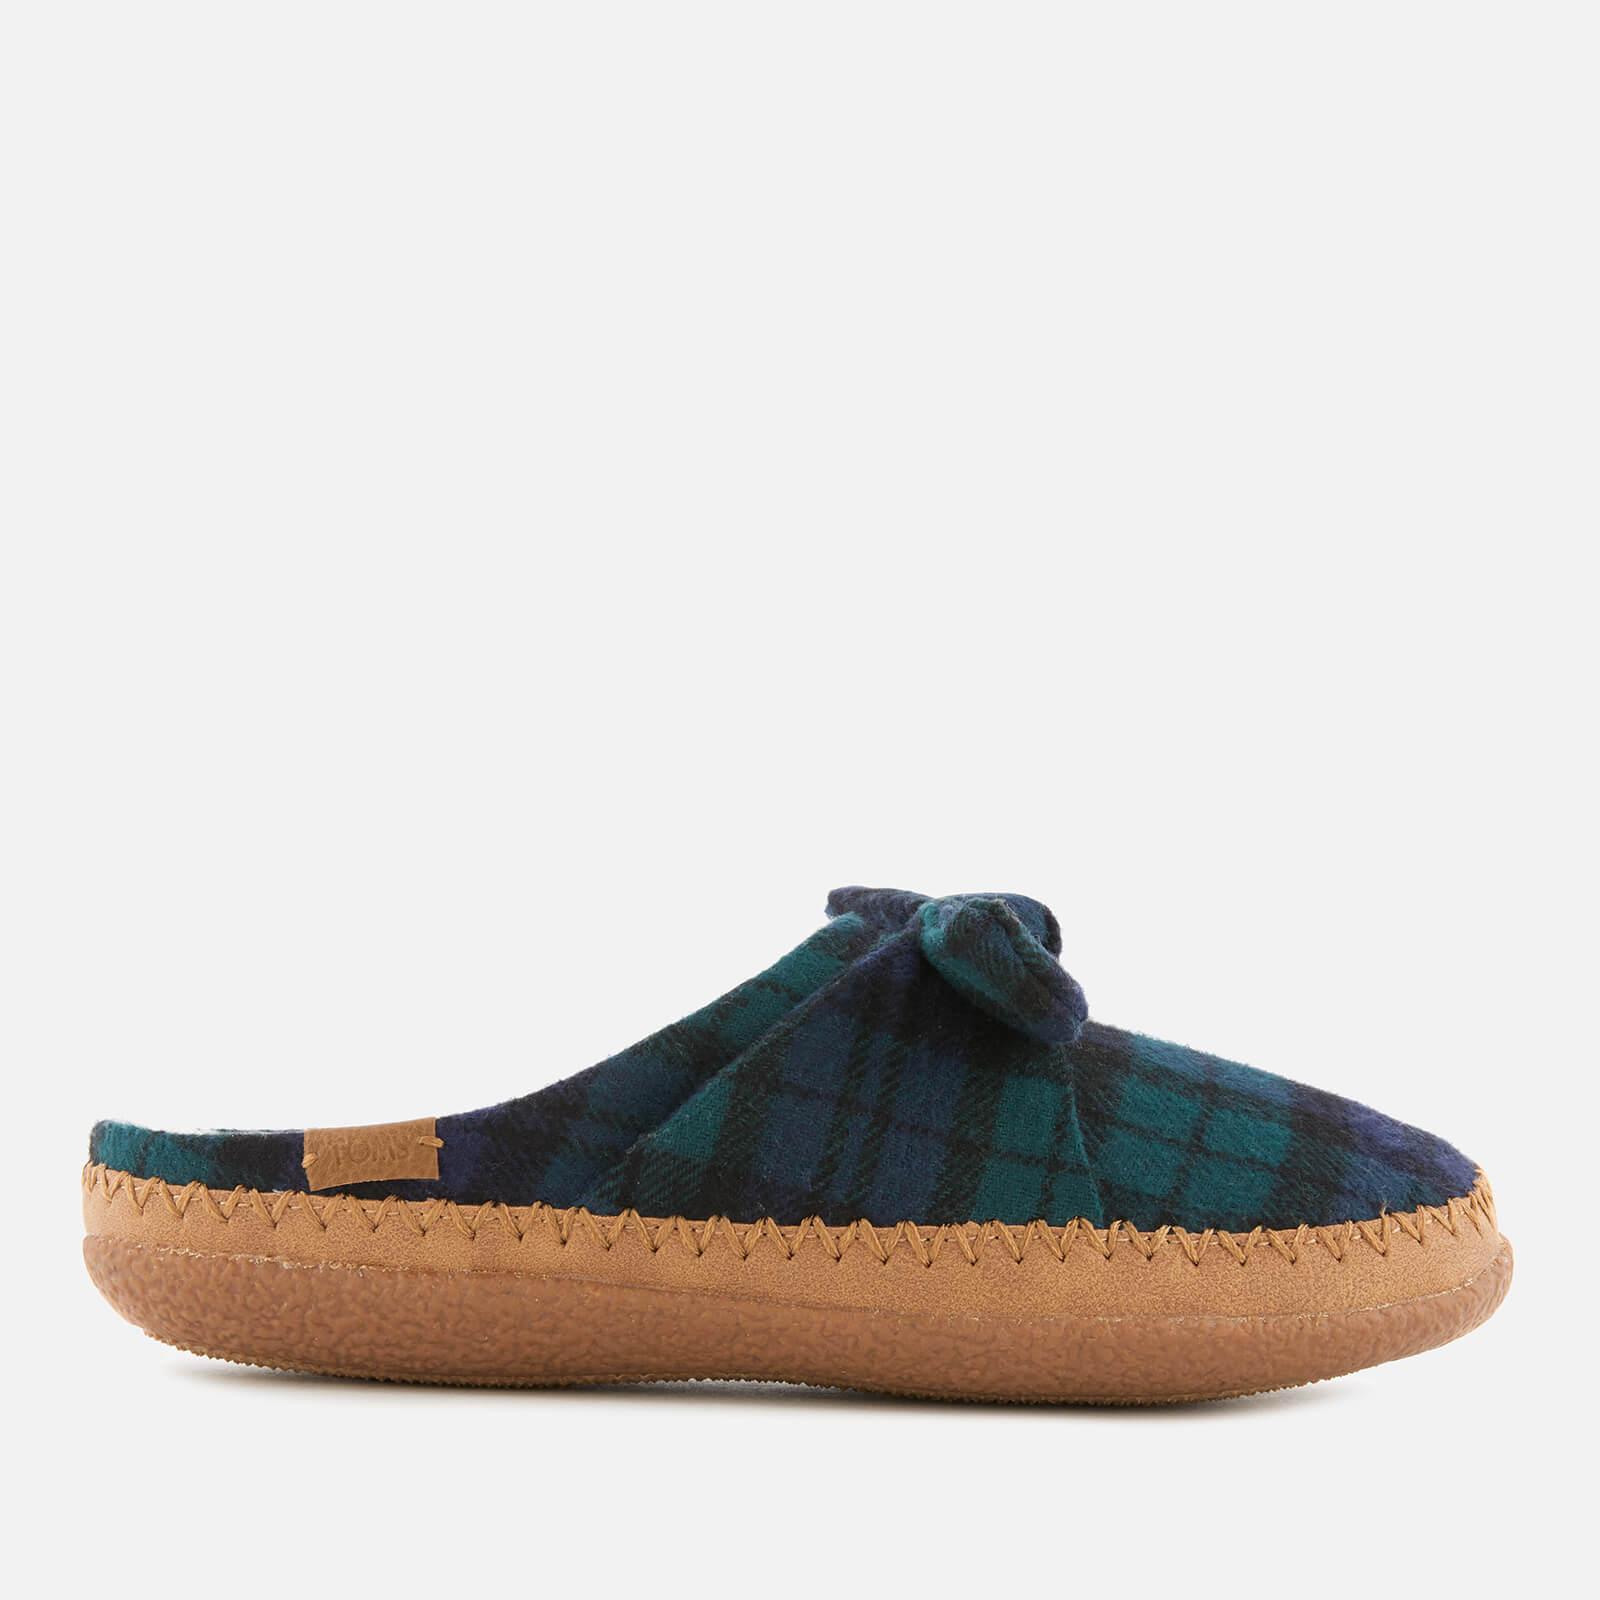 TOMS Women's Plaid Felt Bow Slippers - Spruce - UK 4 - Green